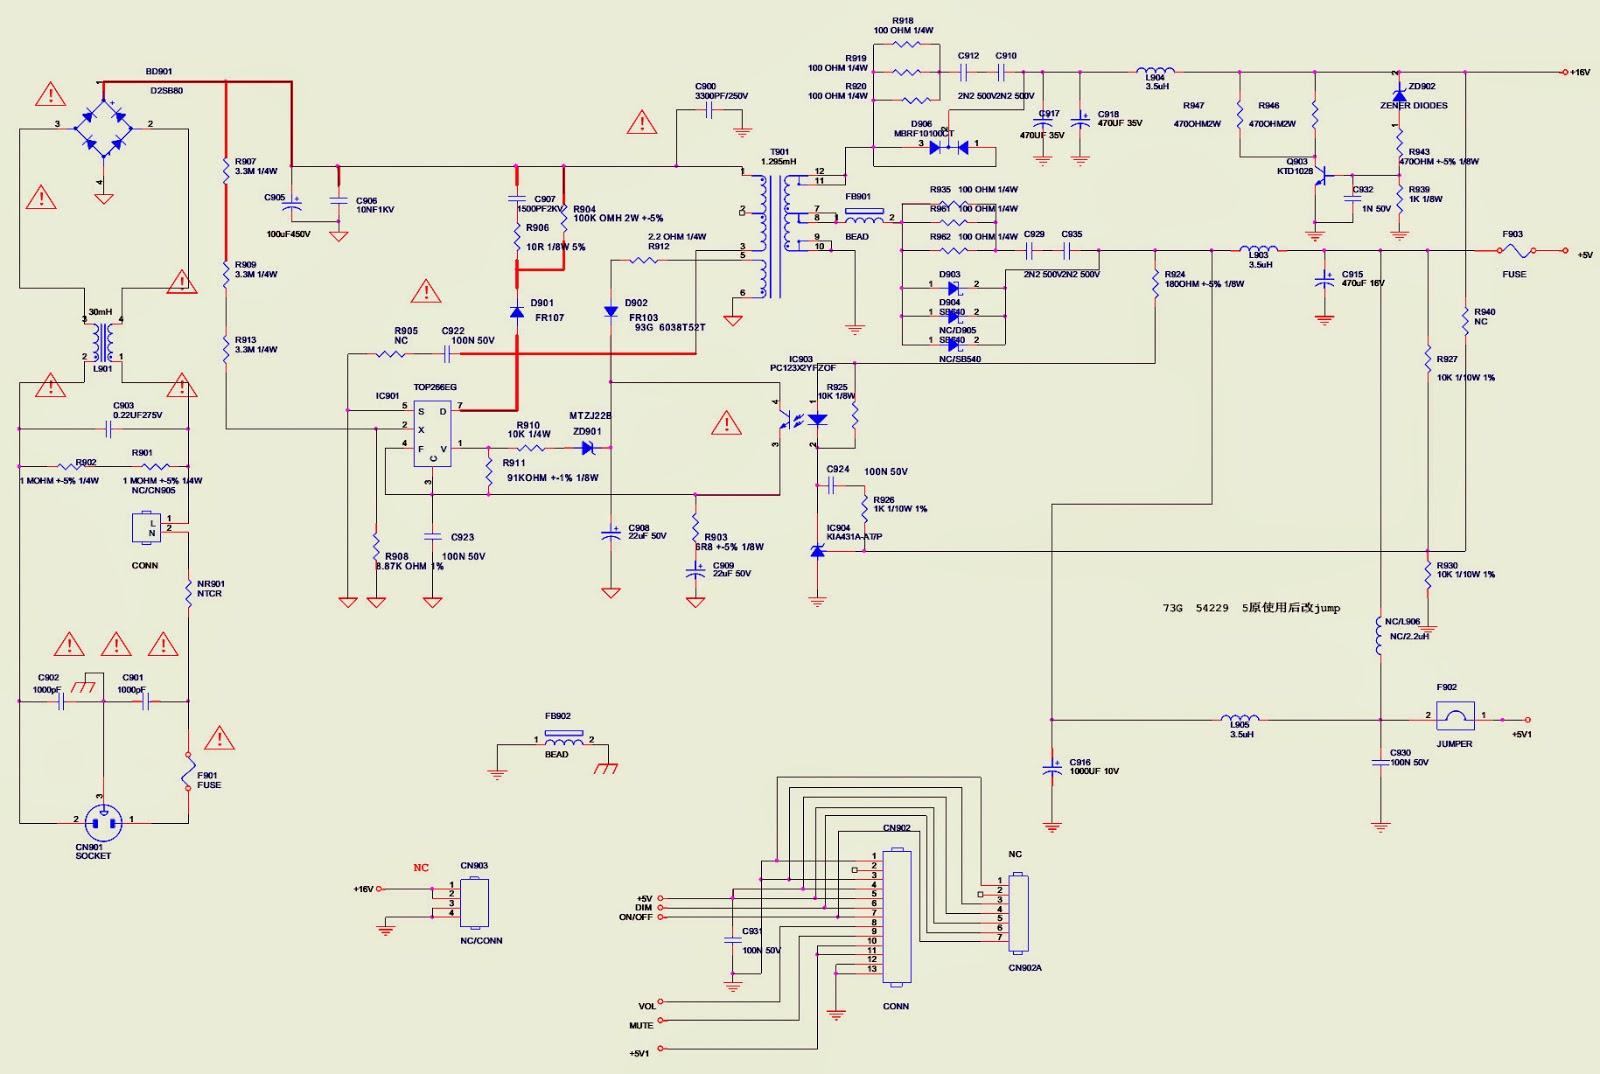 power inverter schematic circuit diagram philips 20. Black Bedroom Furniture Sets. Home Design Ideas